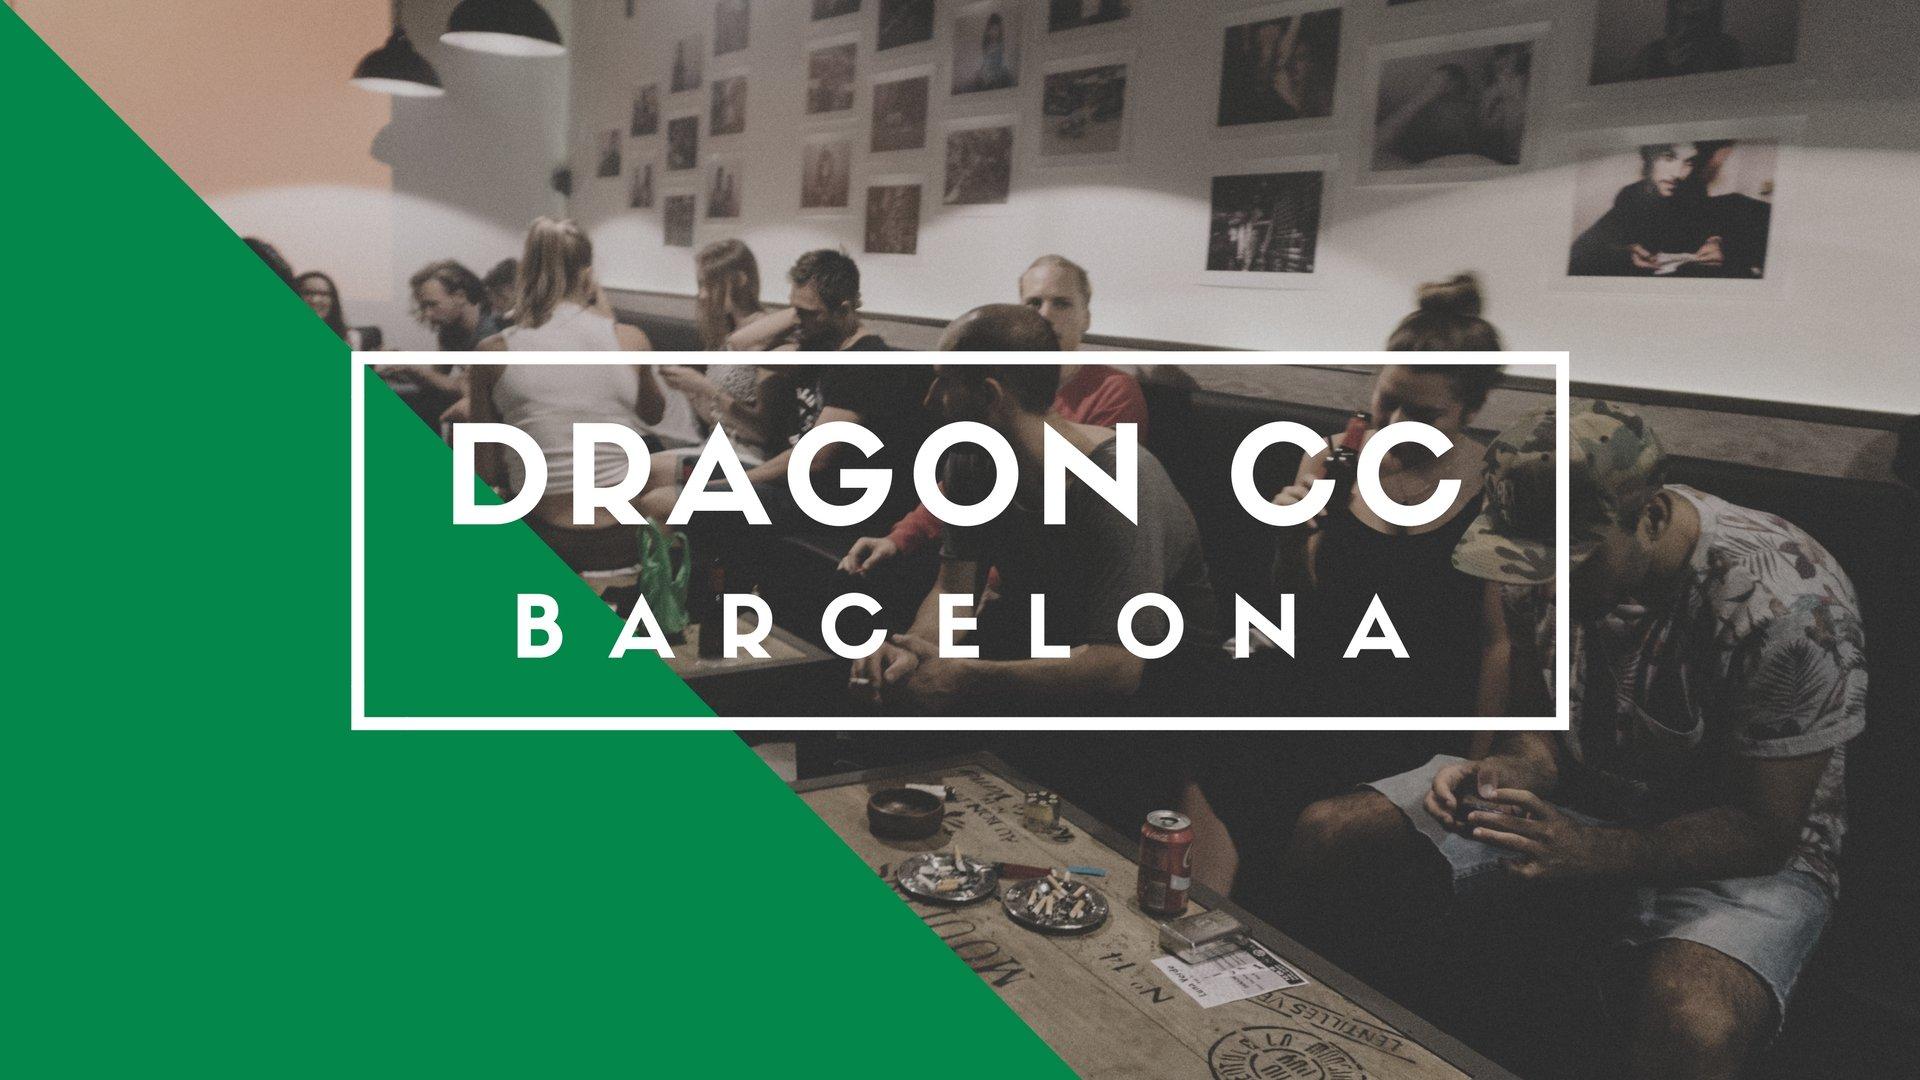 Dragon CC, Barcelona